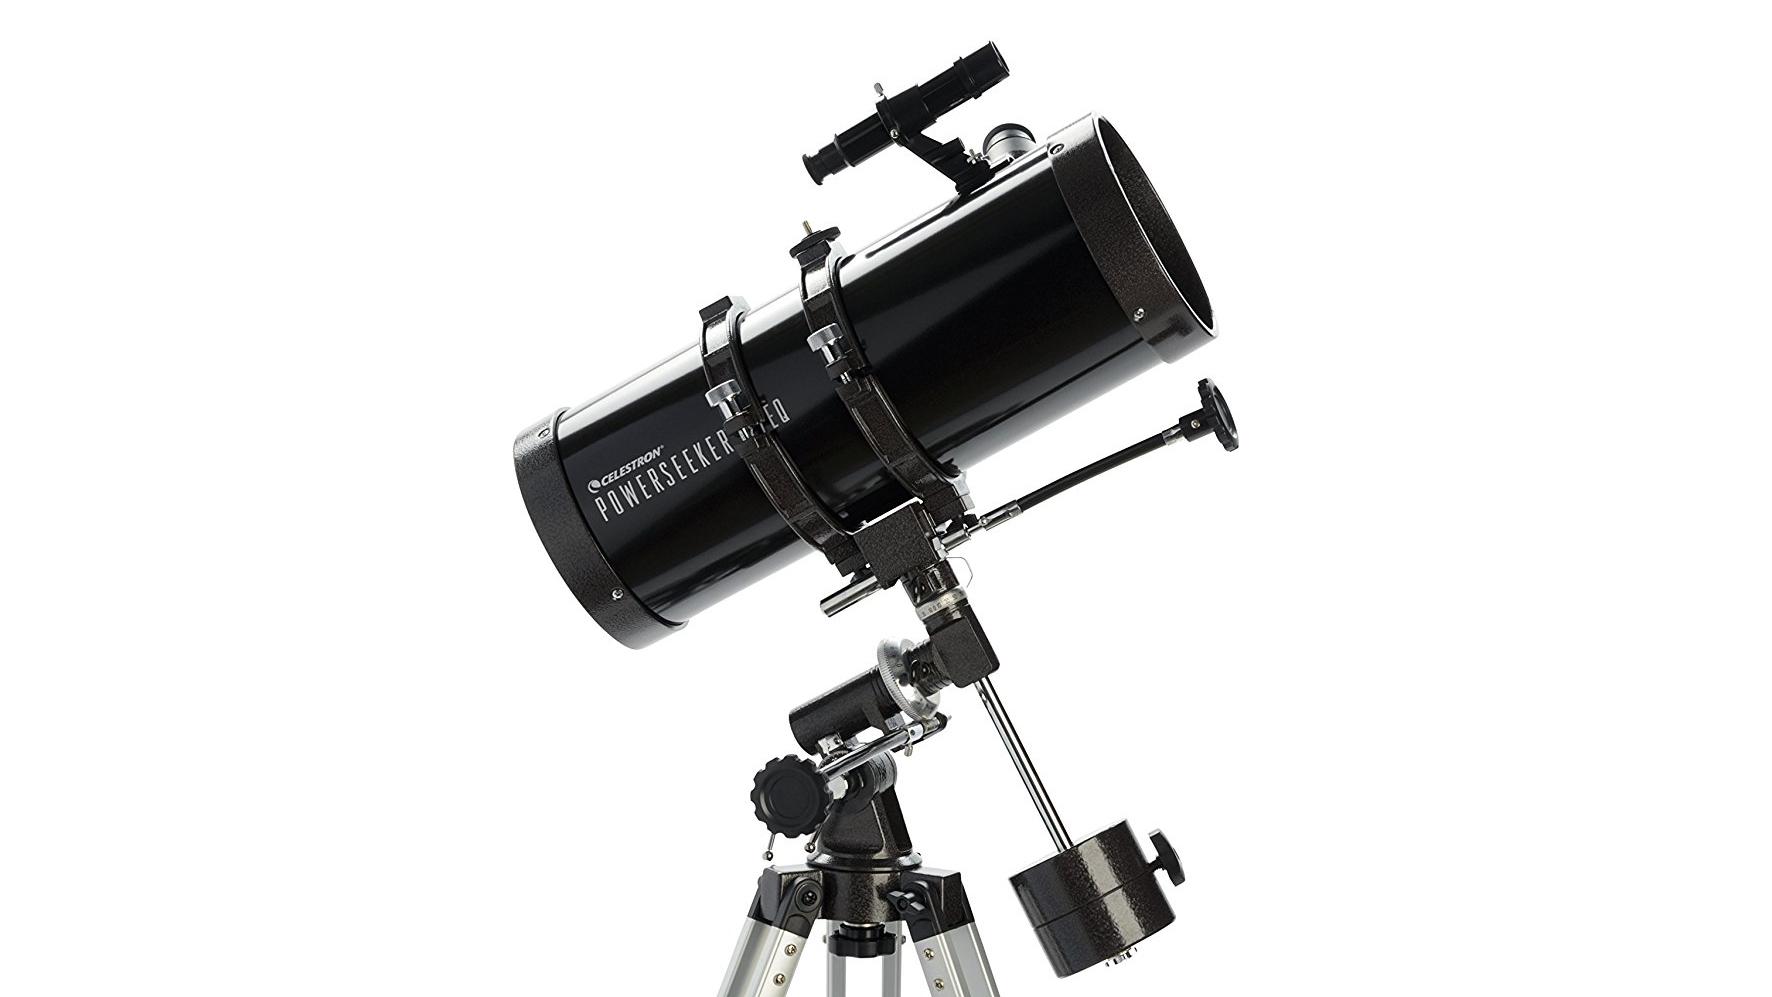 Black Friday 2019: Stellar Deals on Telescopes and Binoculars